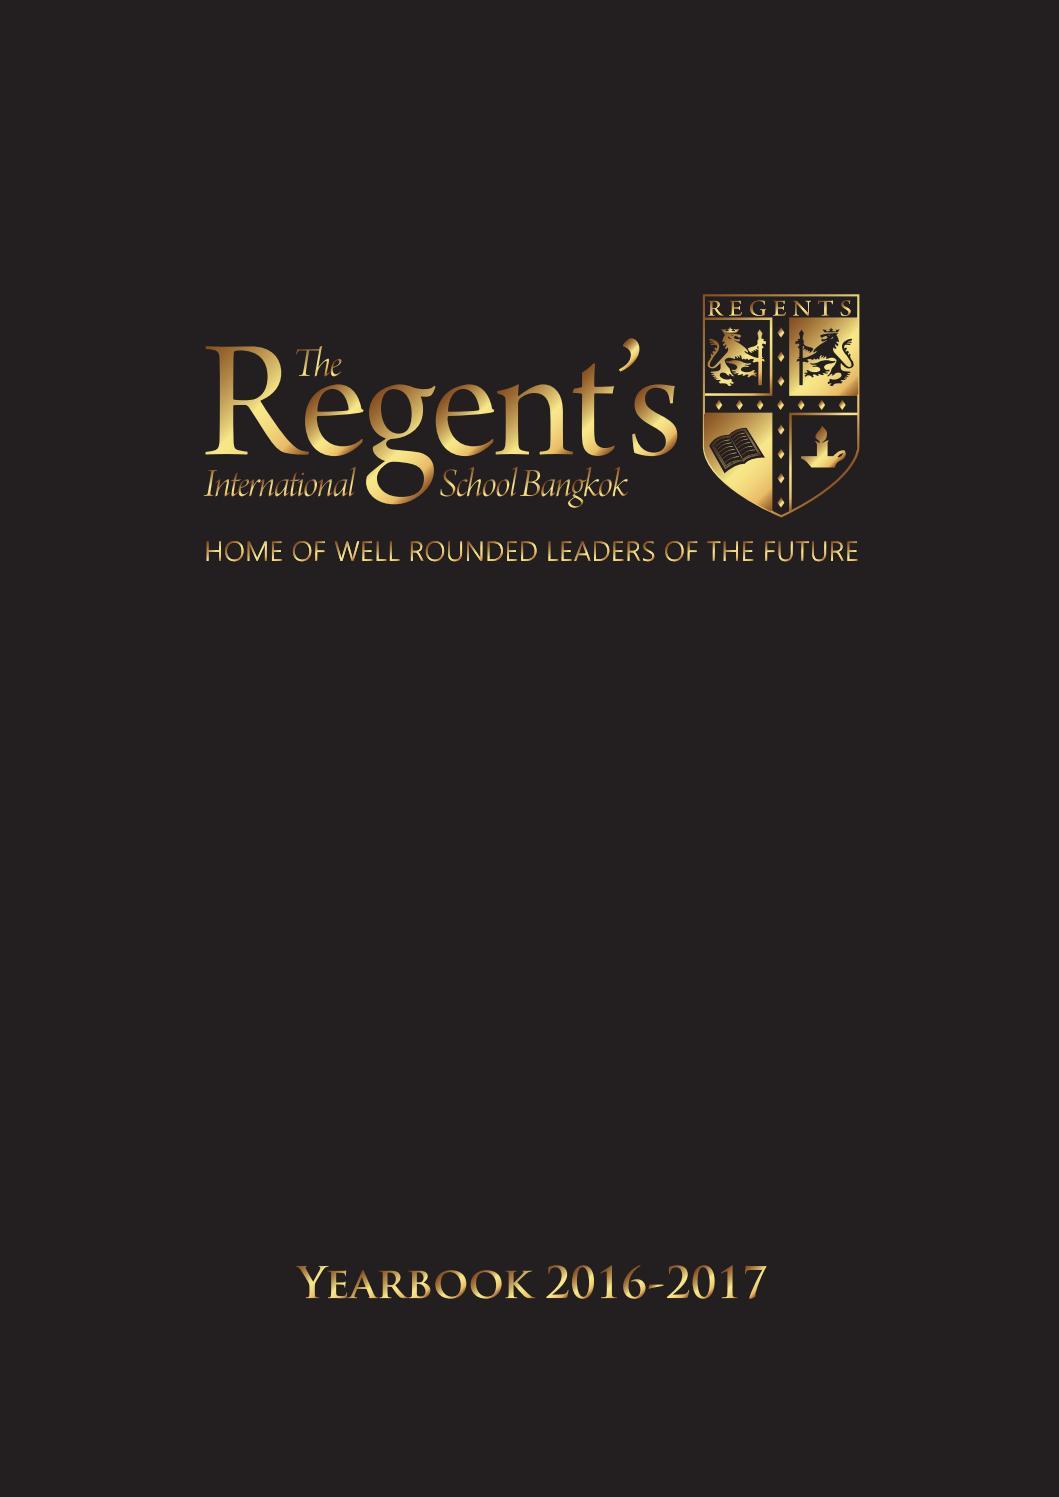 Yearbook 2016-2017 by The Regent's International School